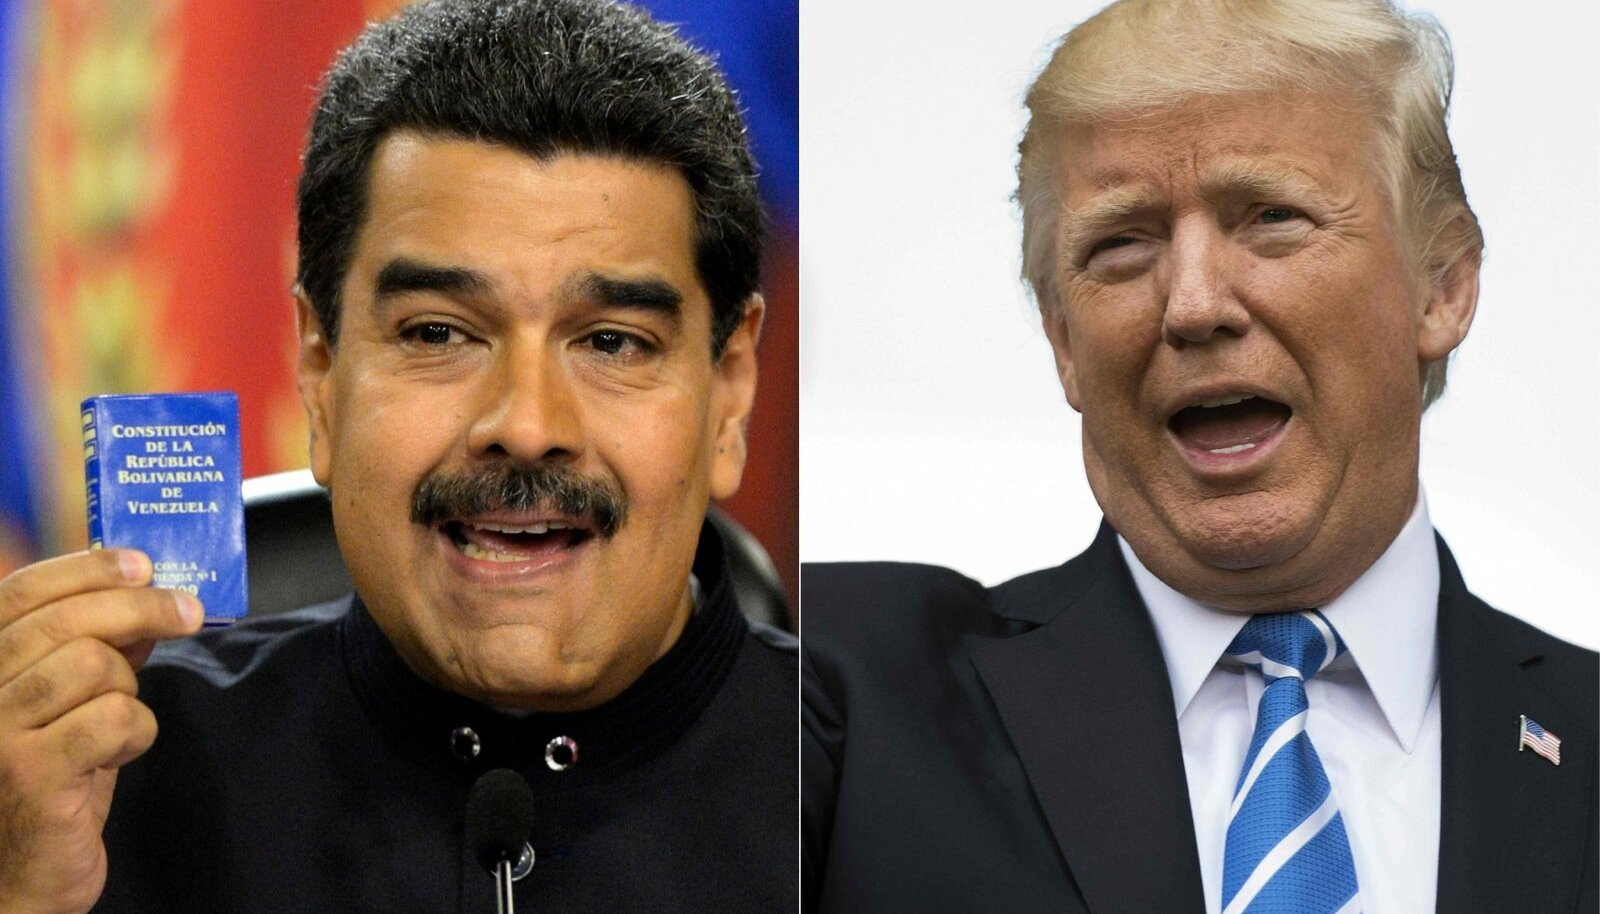 Nicolás Maduro ja Donald Trump